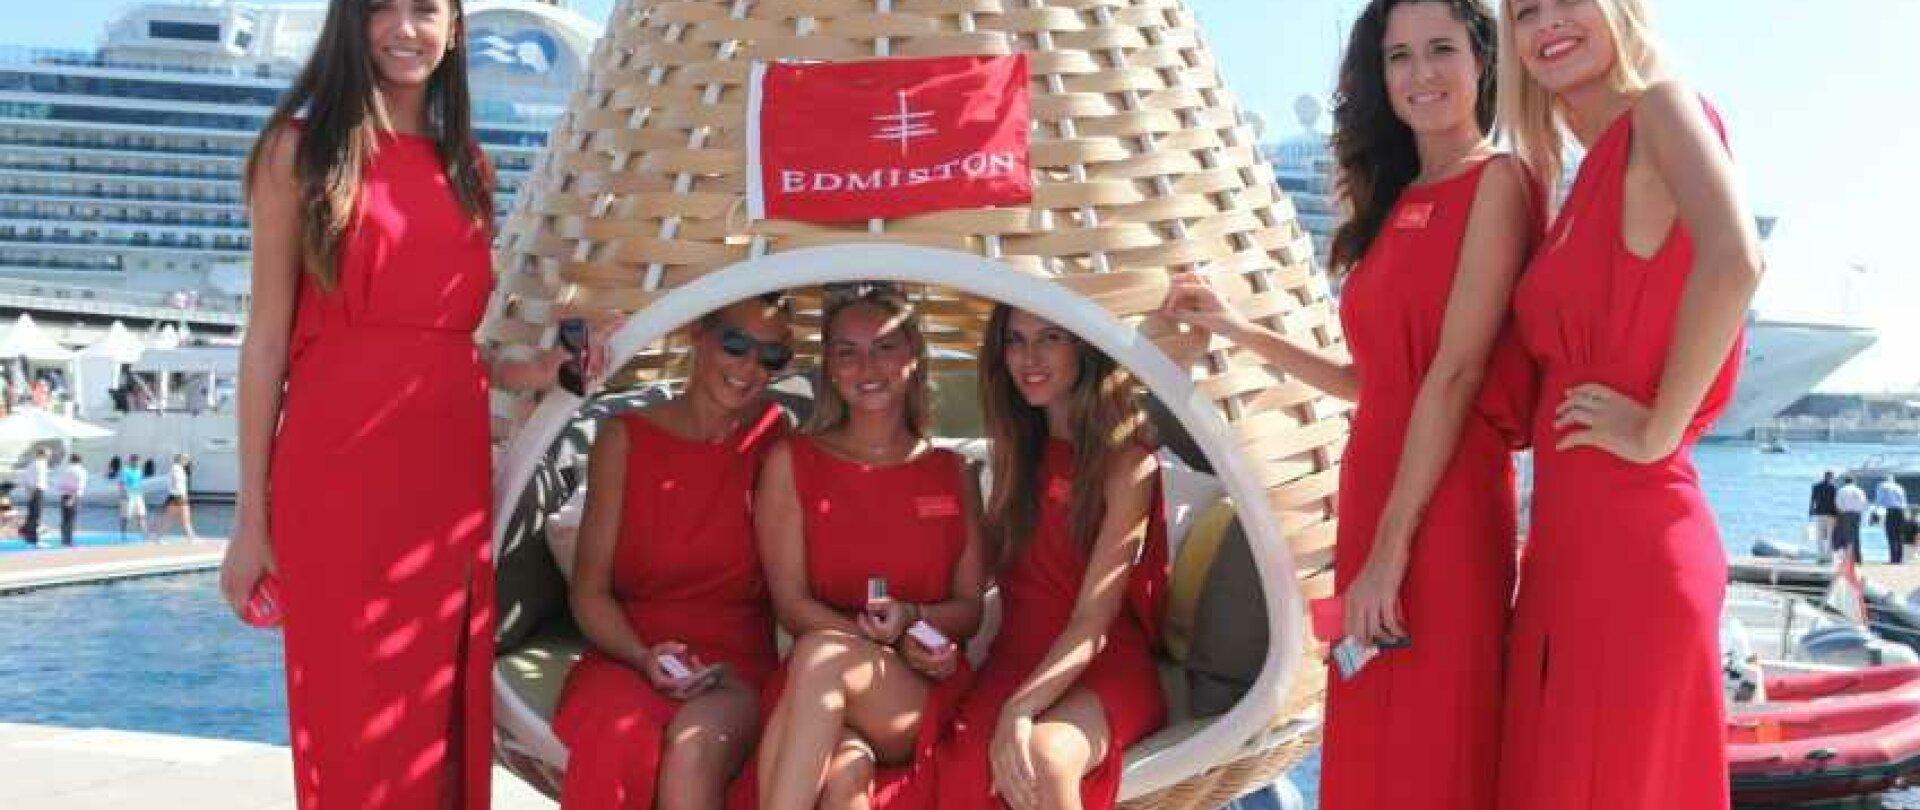 Monaco Yacht Show 2015 photo 6